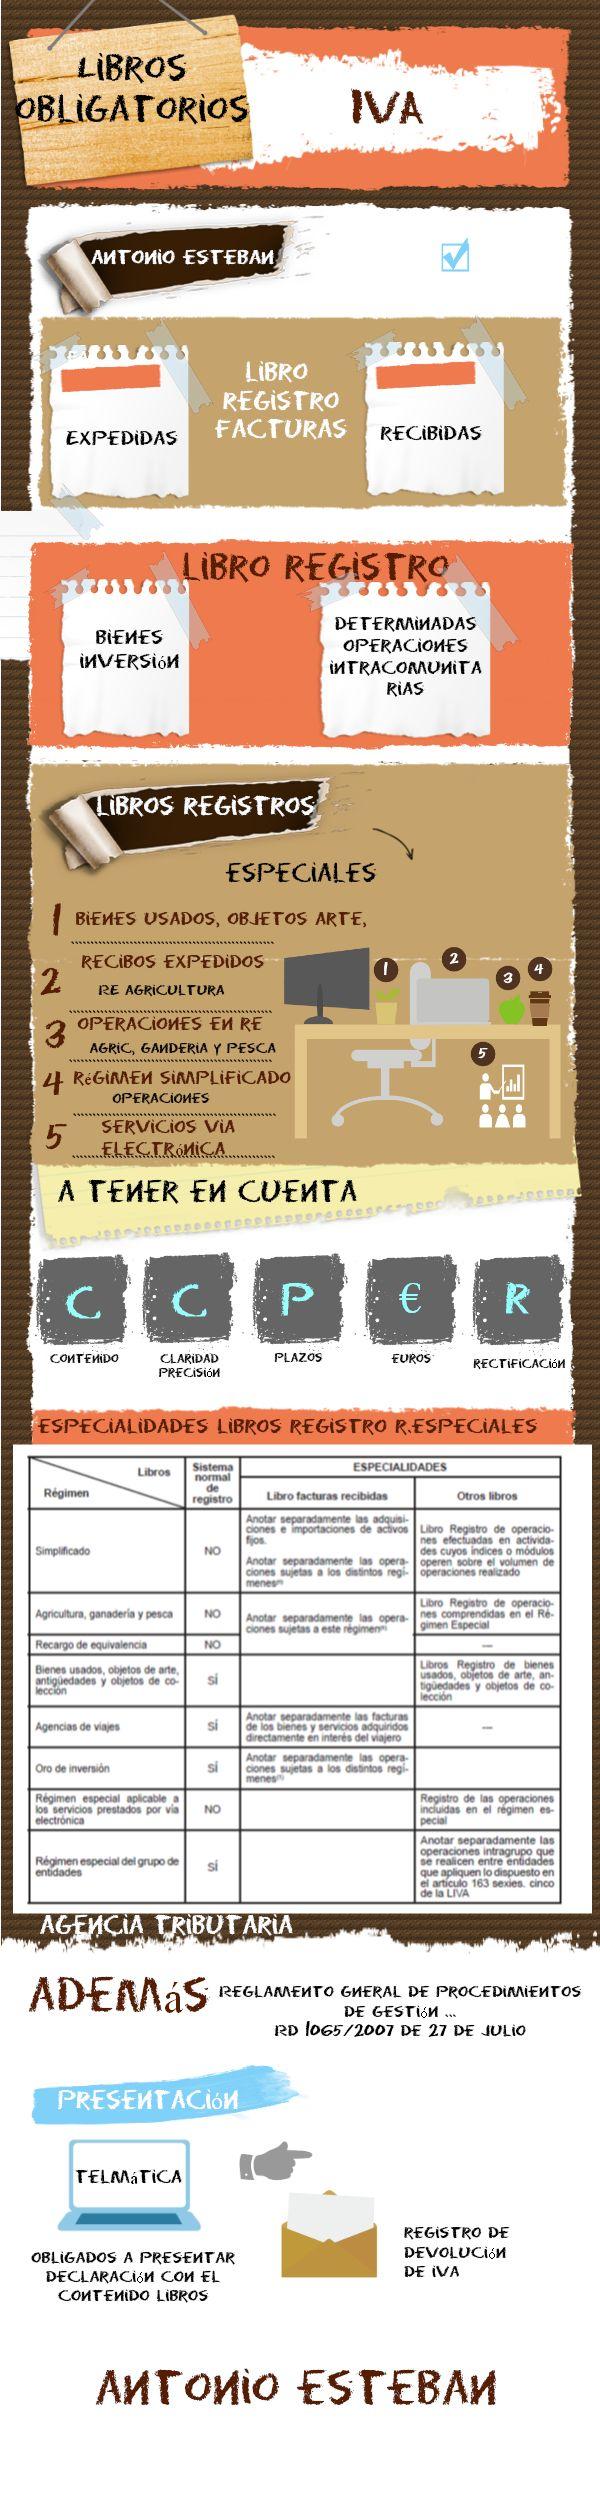 Libros obligatorios del IVA #infografia #infographic #controlpyme